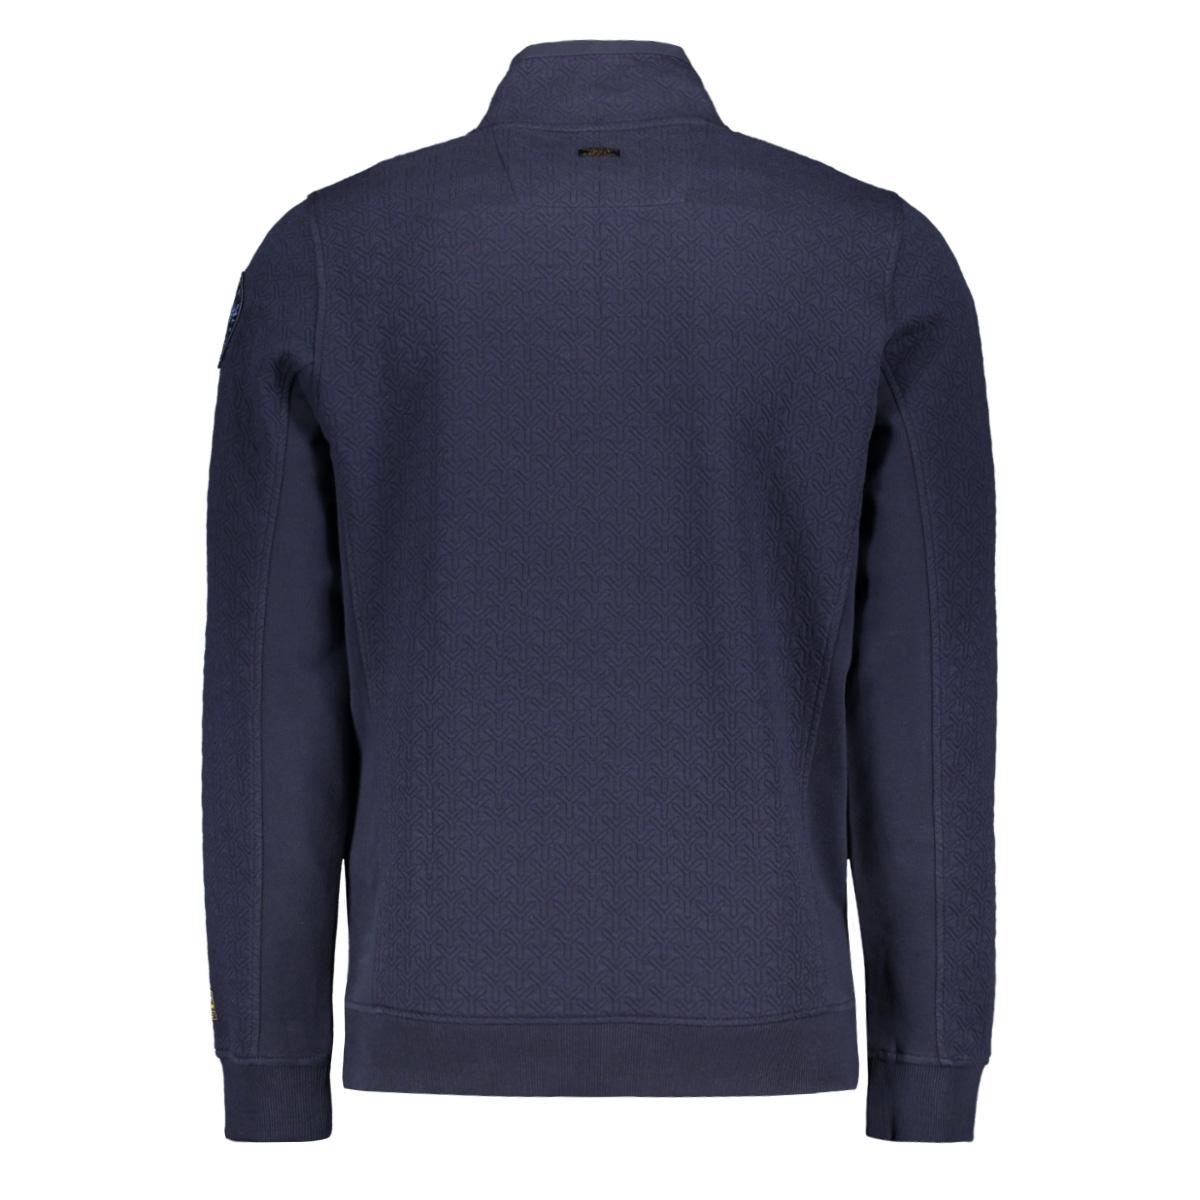 sweat jacket psw201402 pme legend vest 5287